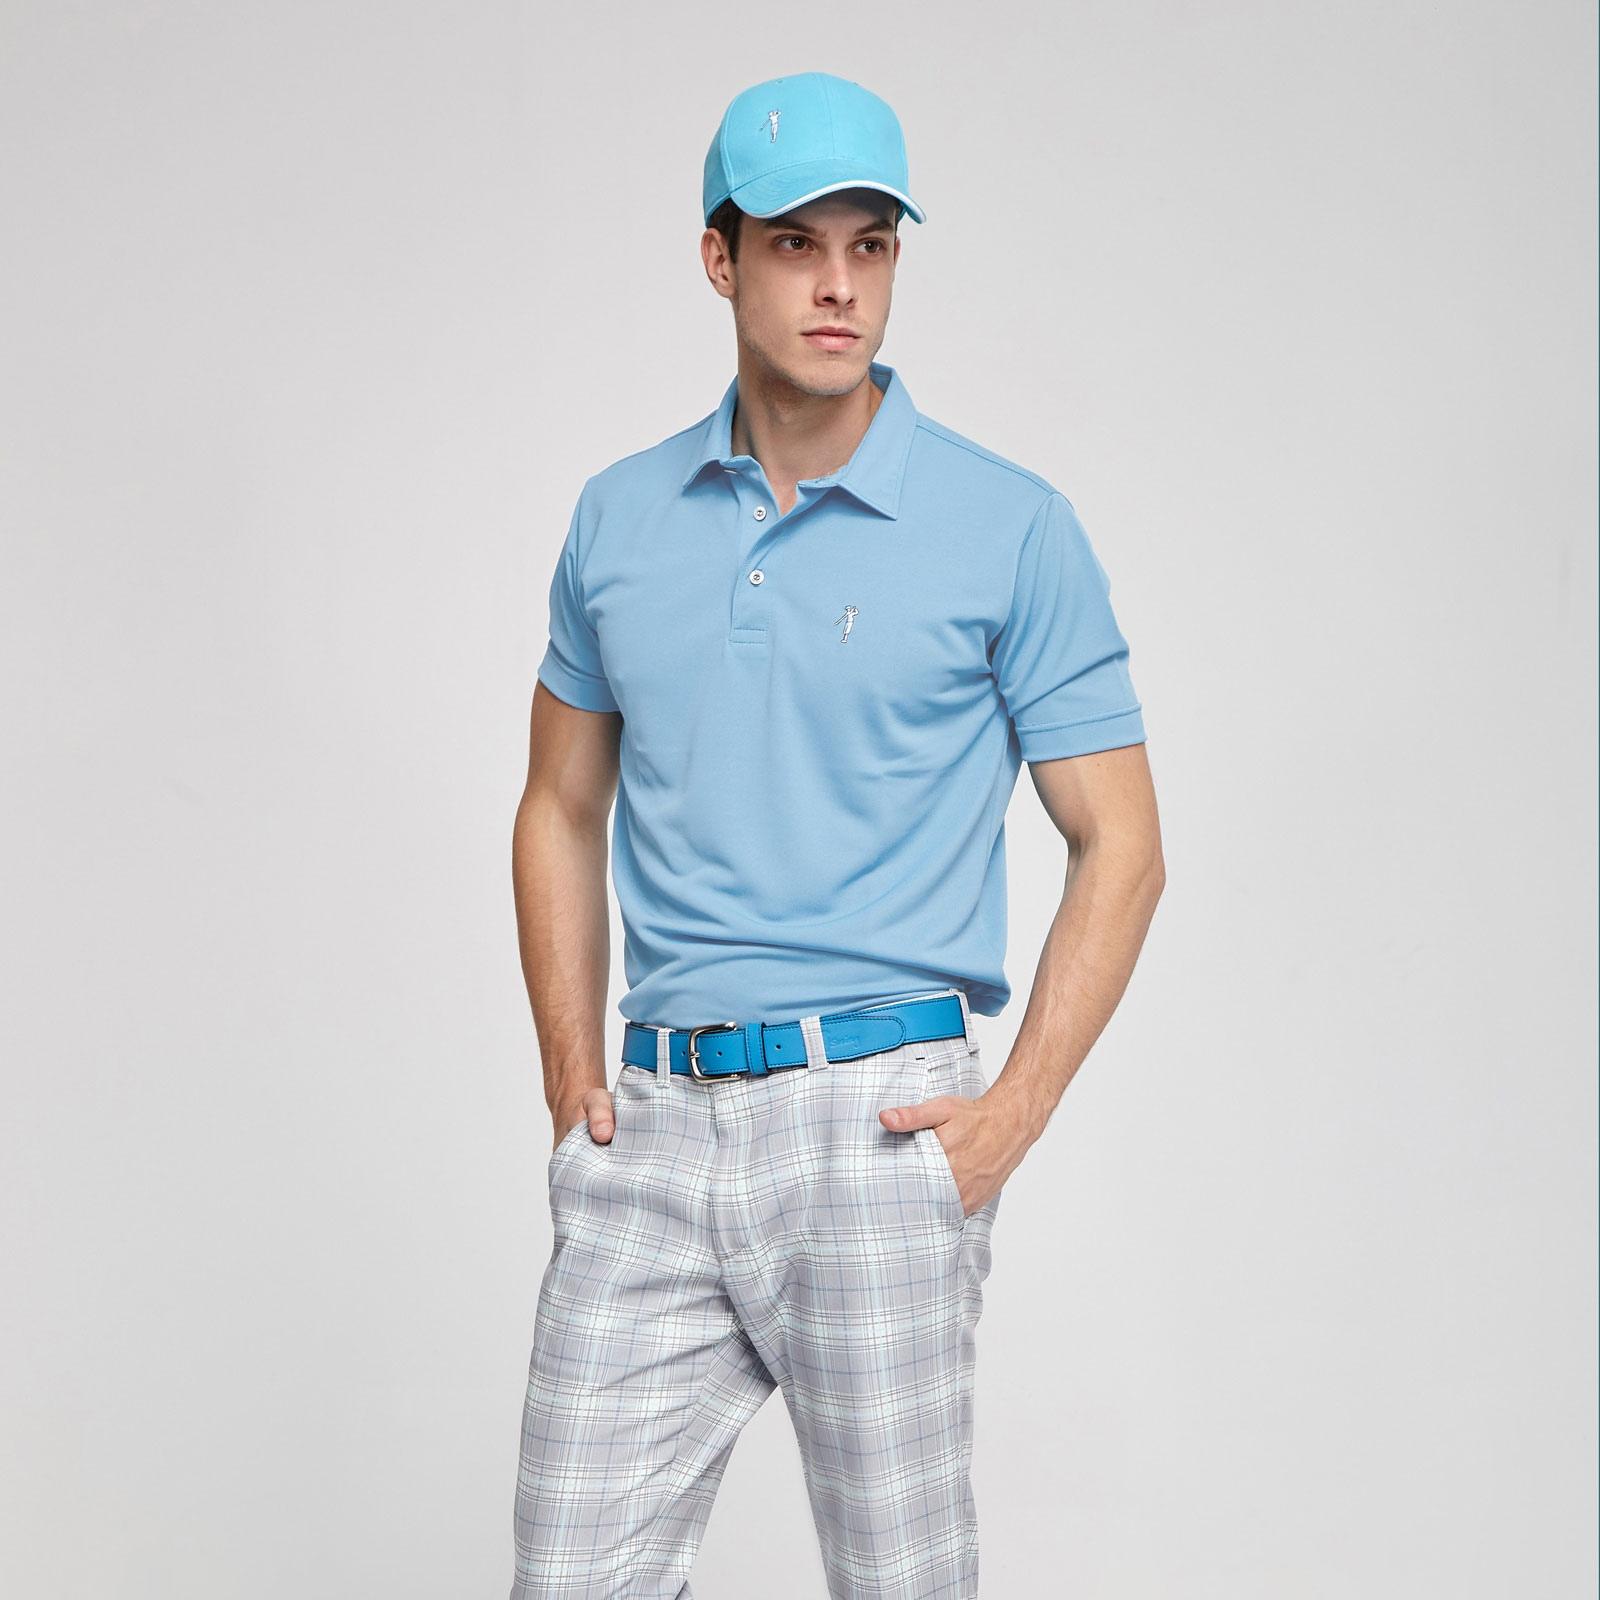 Polo tecnico golf celeste